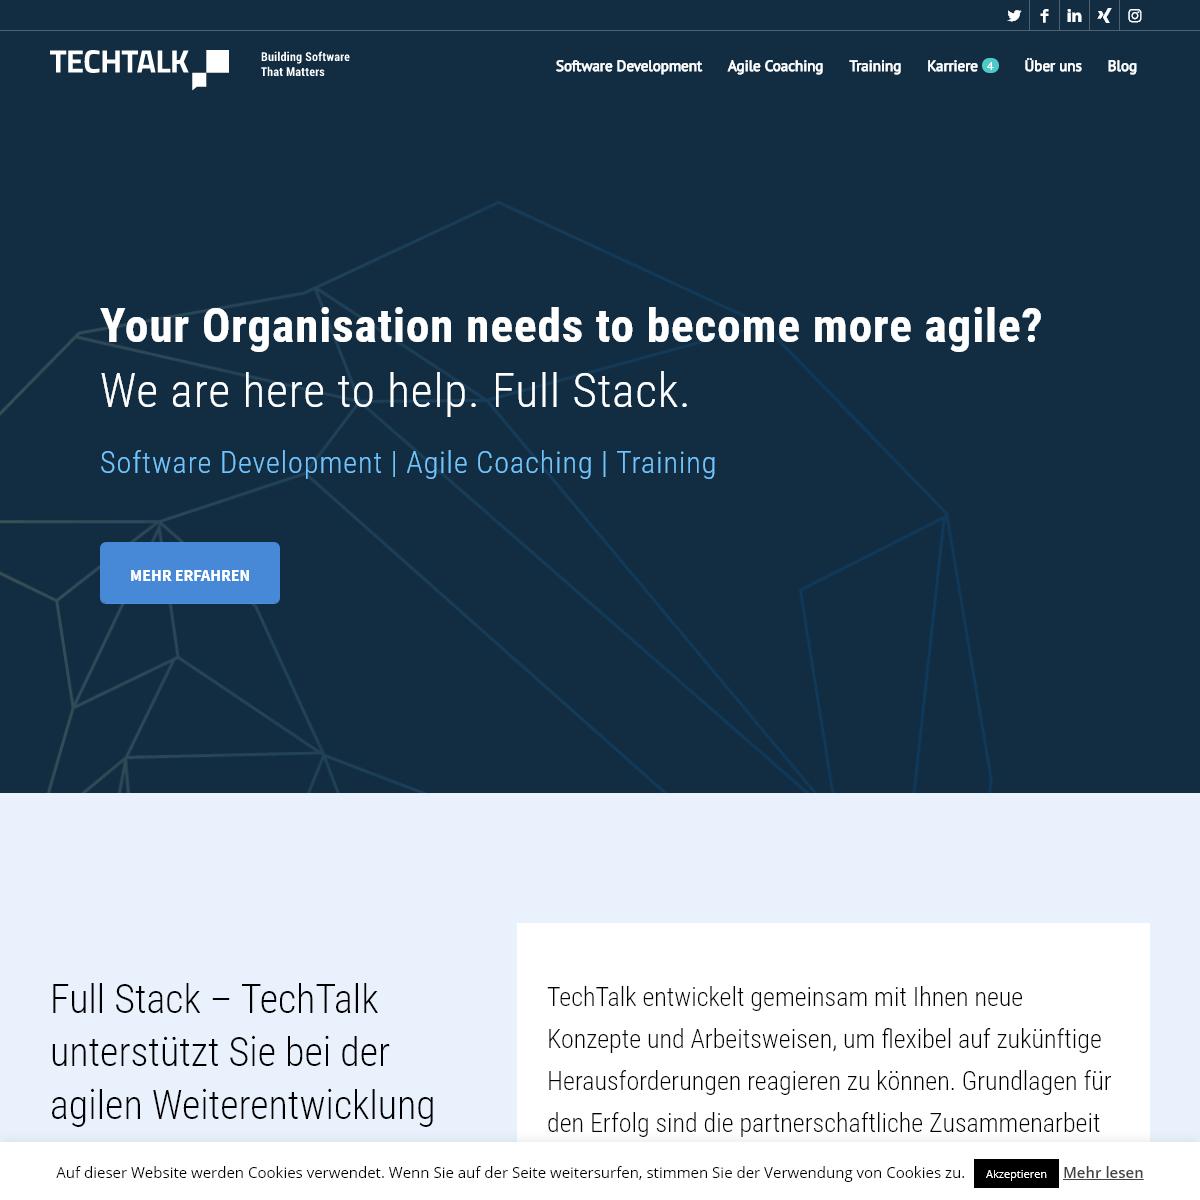 TechTalk - Software Development - Agile Coaching - Training